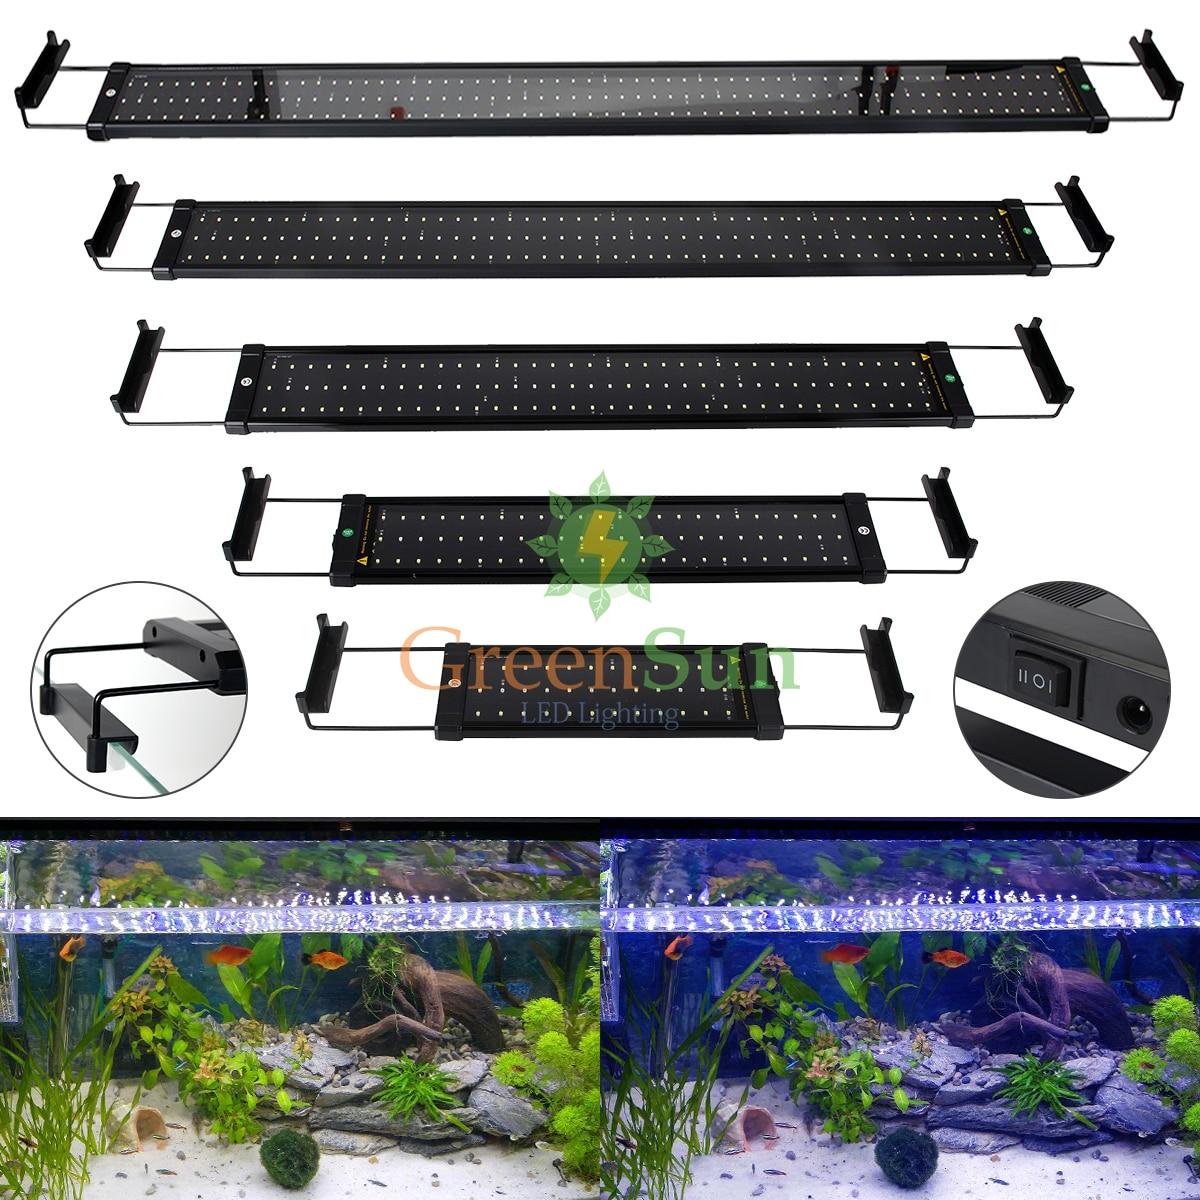 EU Plug Aquarium Fish Tank <font><b>Light</b></font> <font><b>LED</b></font> Fish Tank <font><b>light</b></font> Aquarium Decor Clip Lamp 6W 11W